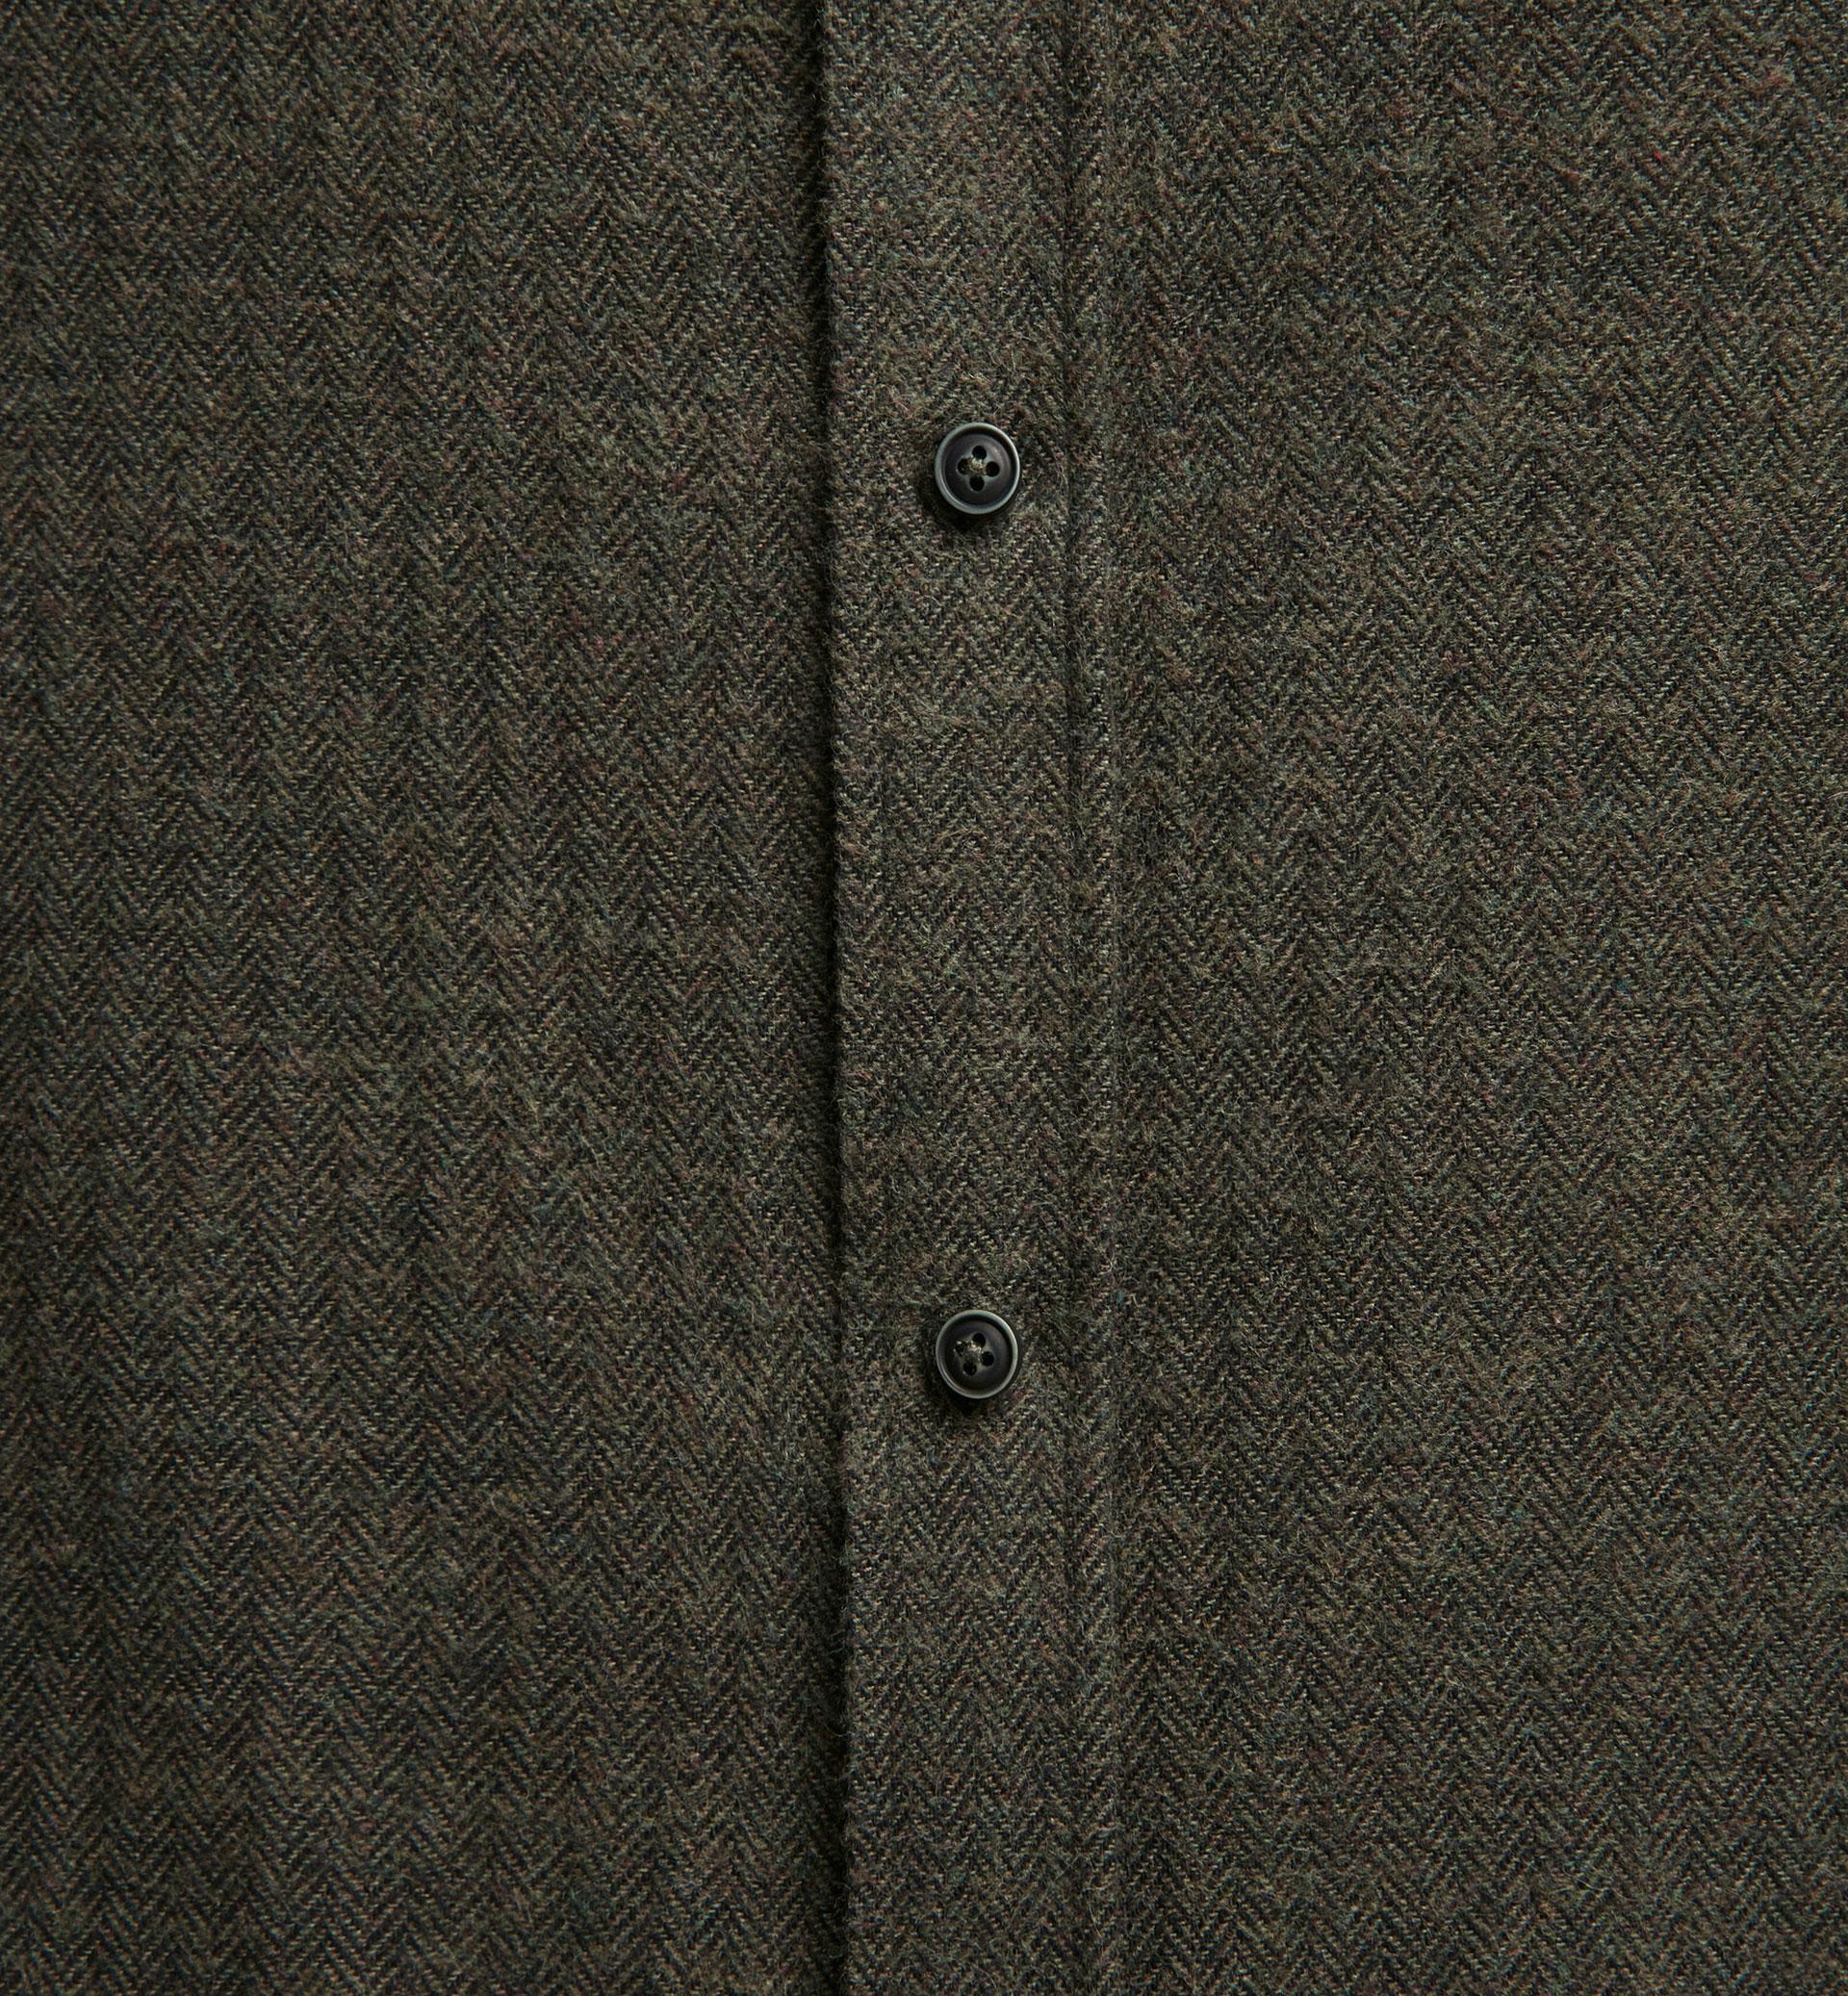 SLIM HERRINGBONE GREEN SHIRT